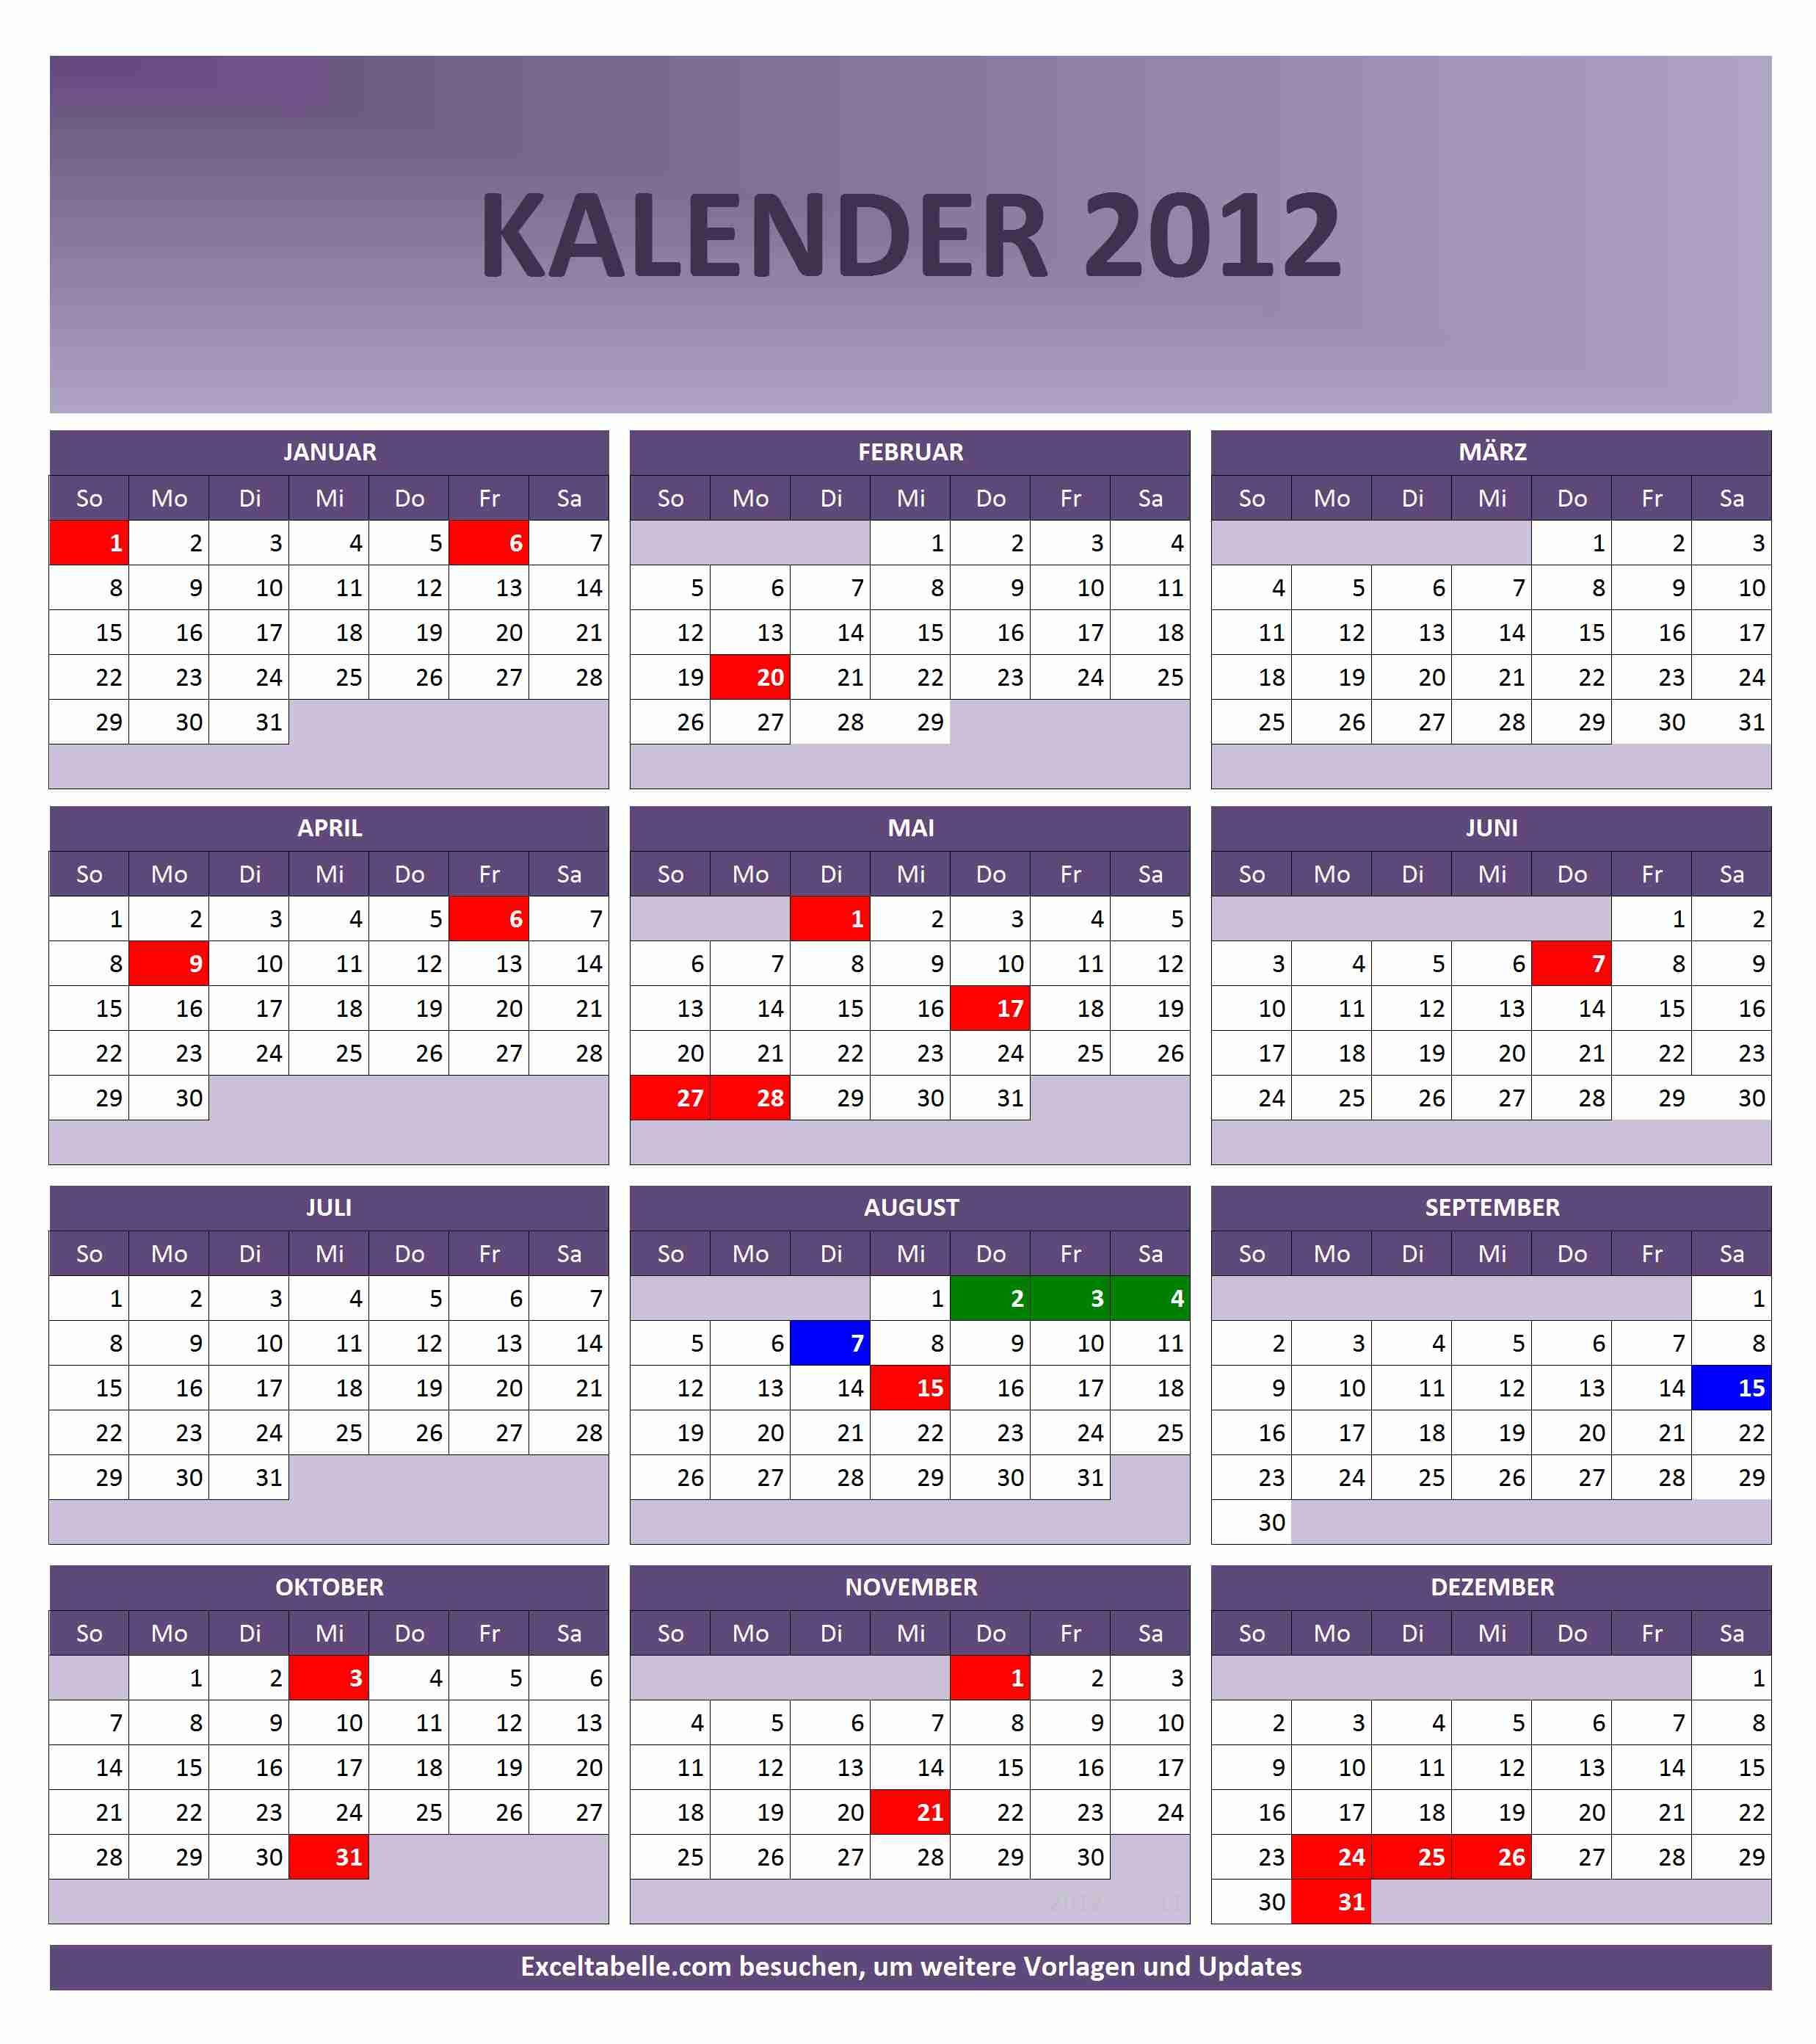 Kalender-2012